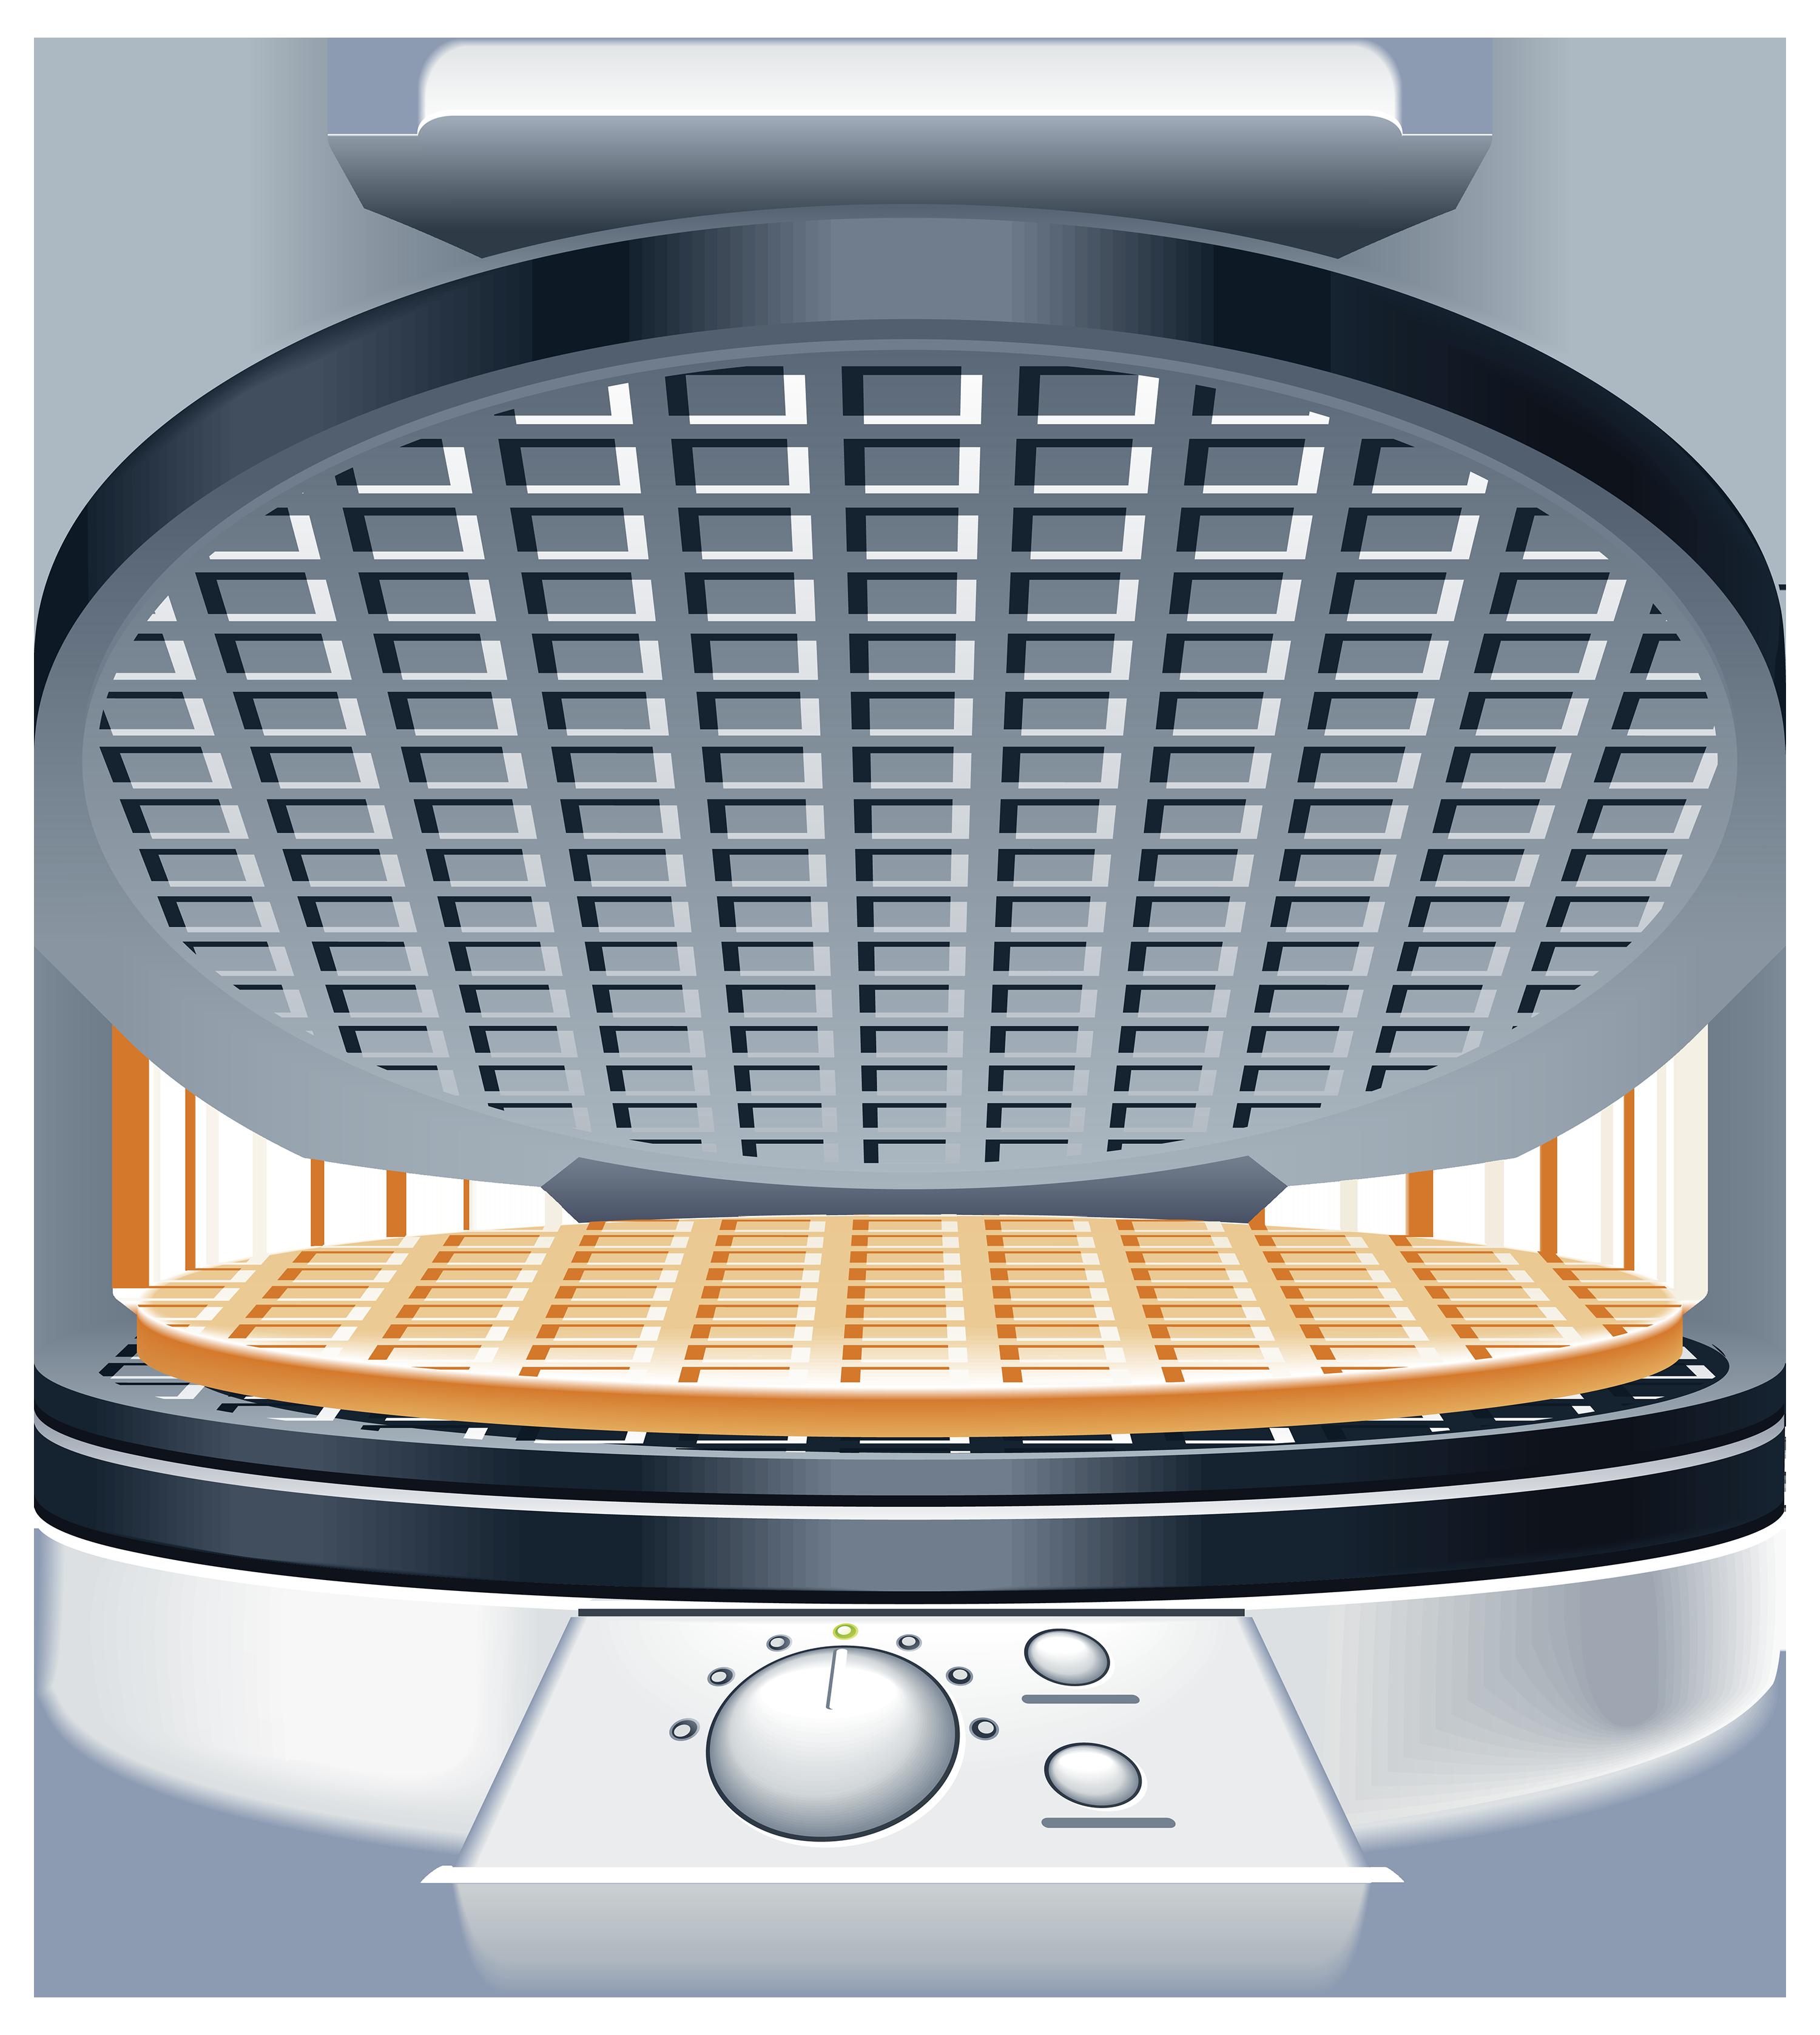 Waffle iron clipart.